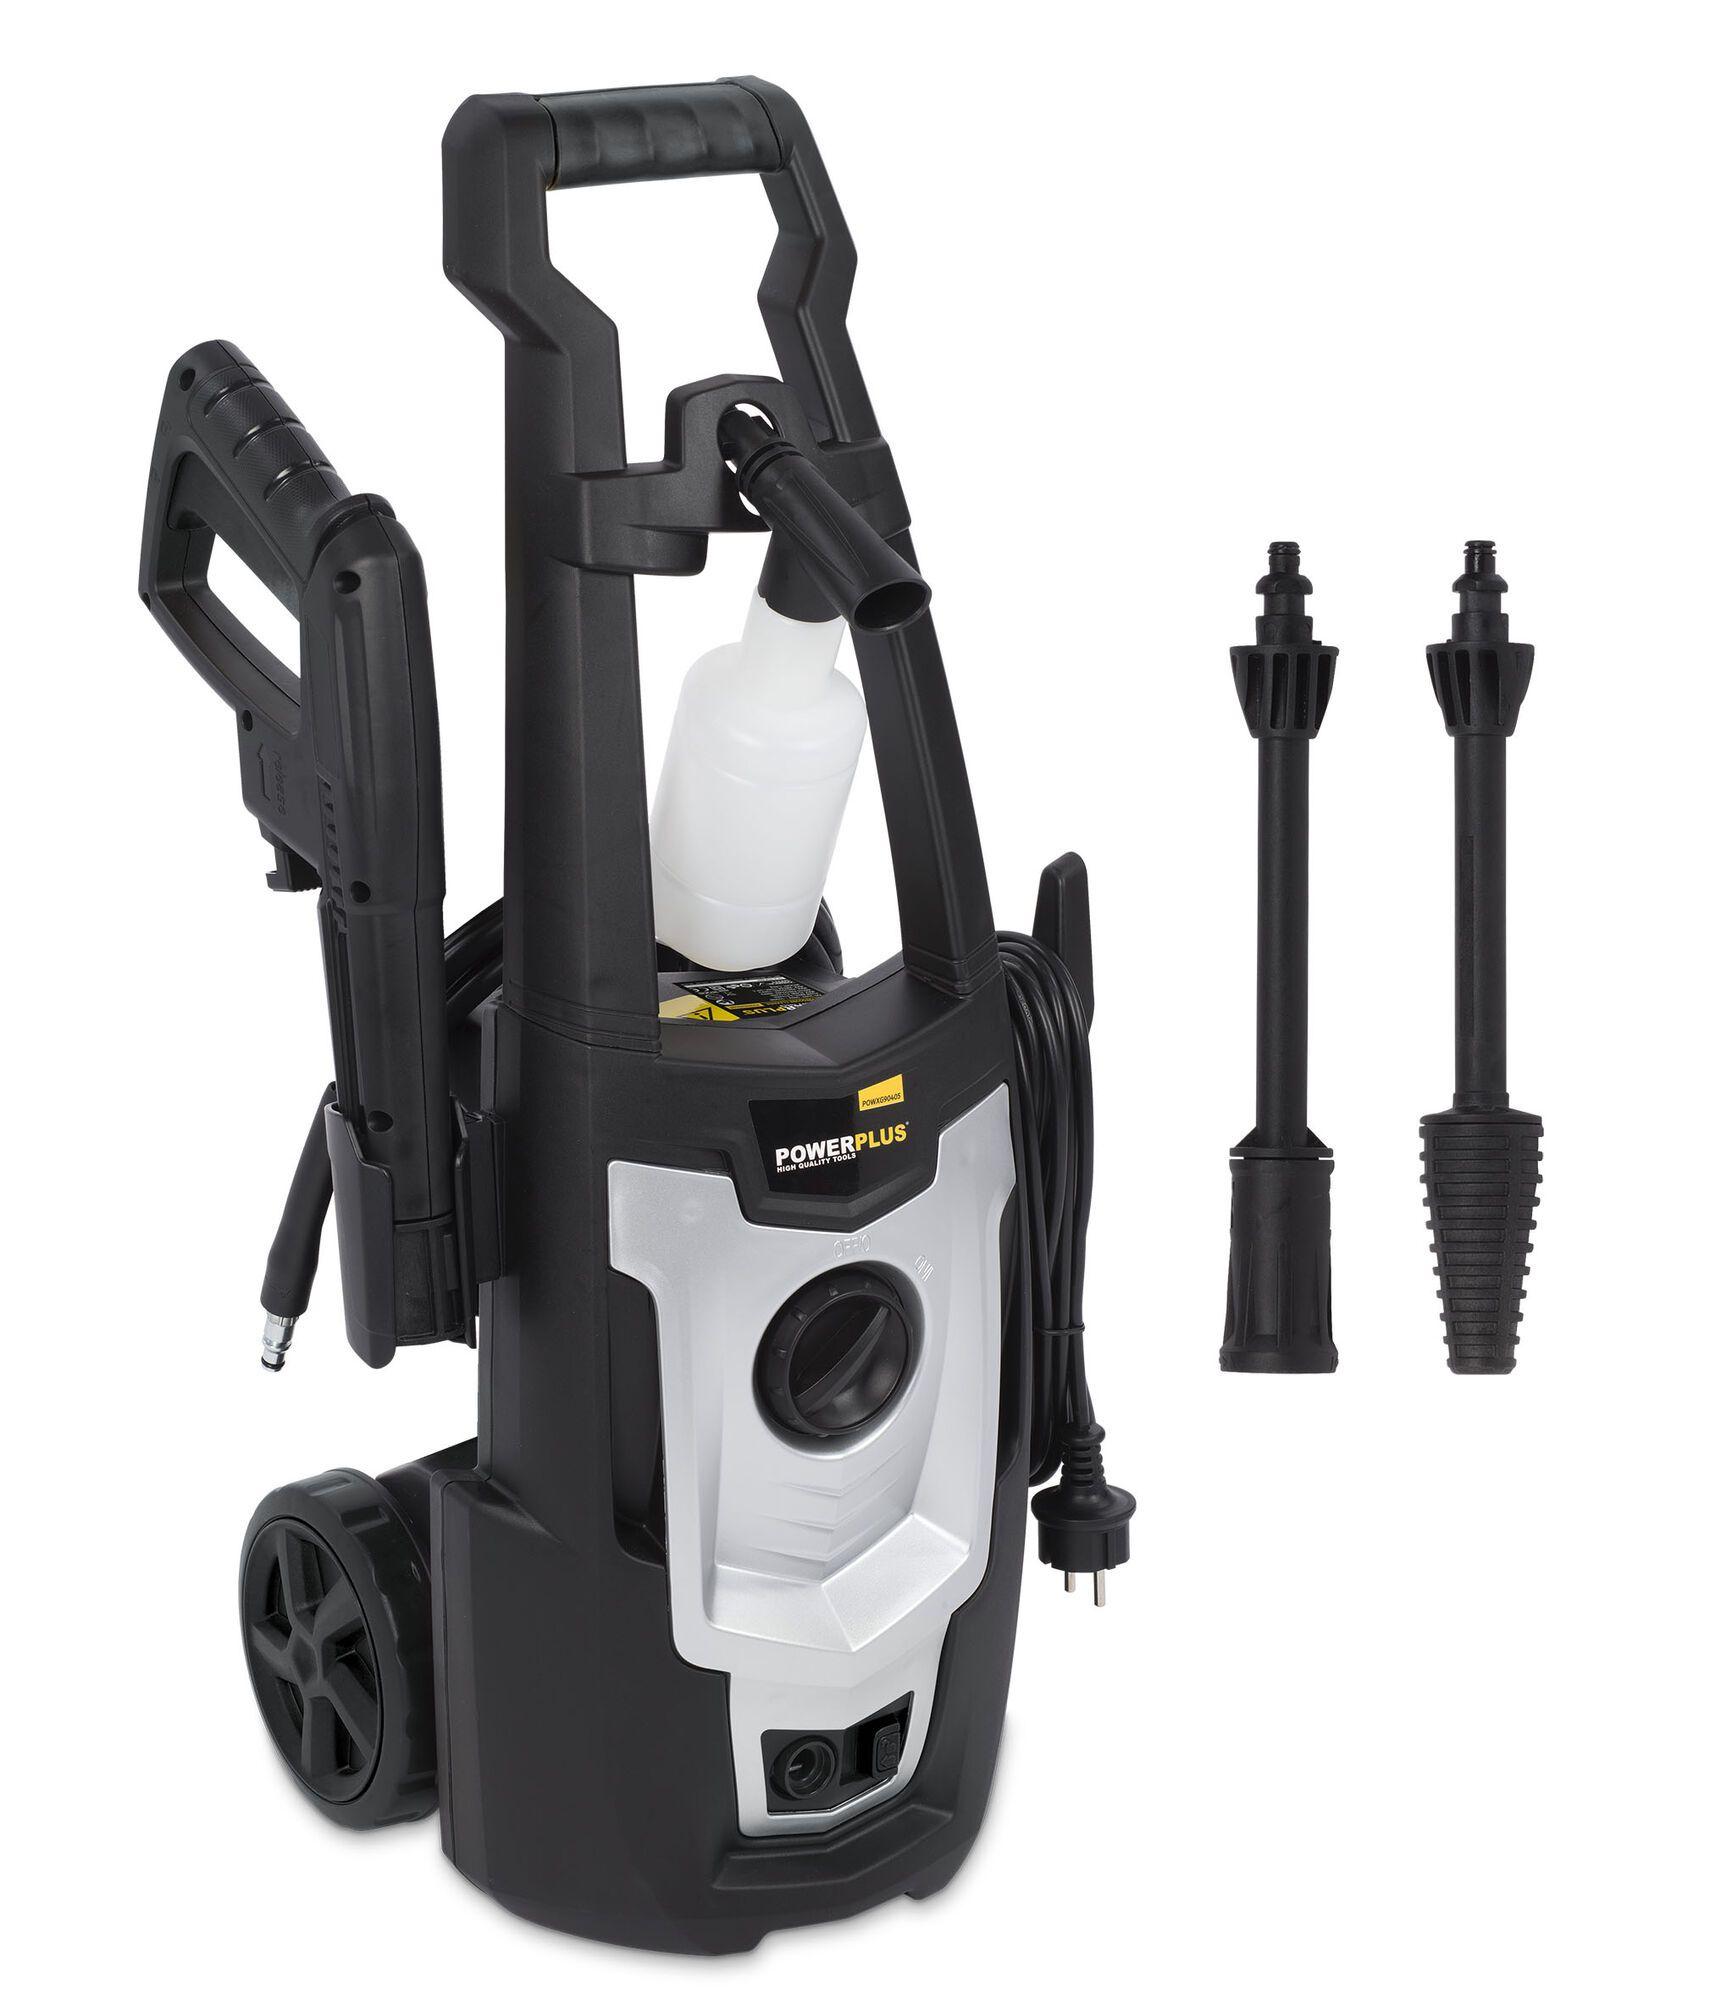 Powerplus POWXG90405 Elektrisch Hogedrukreiniger   Hogedrukspuit (hogedrukreinigers elektrisch)